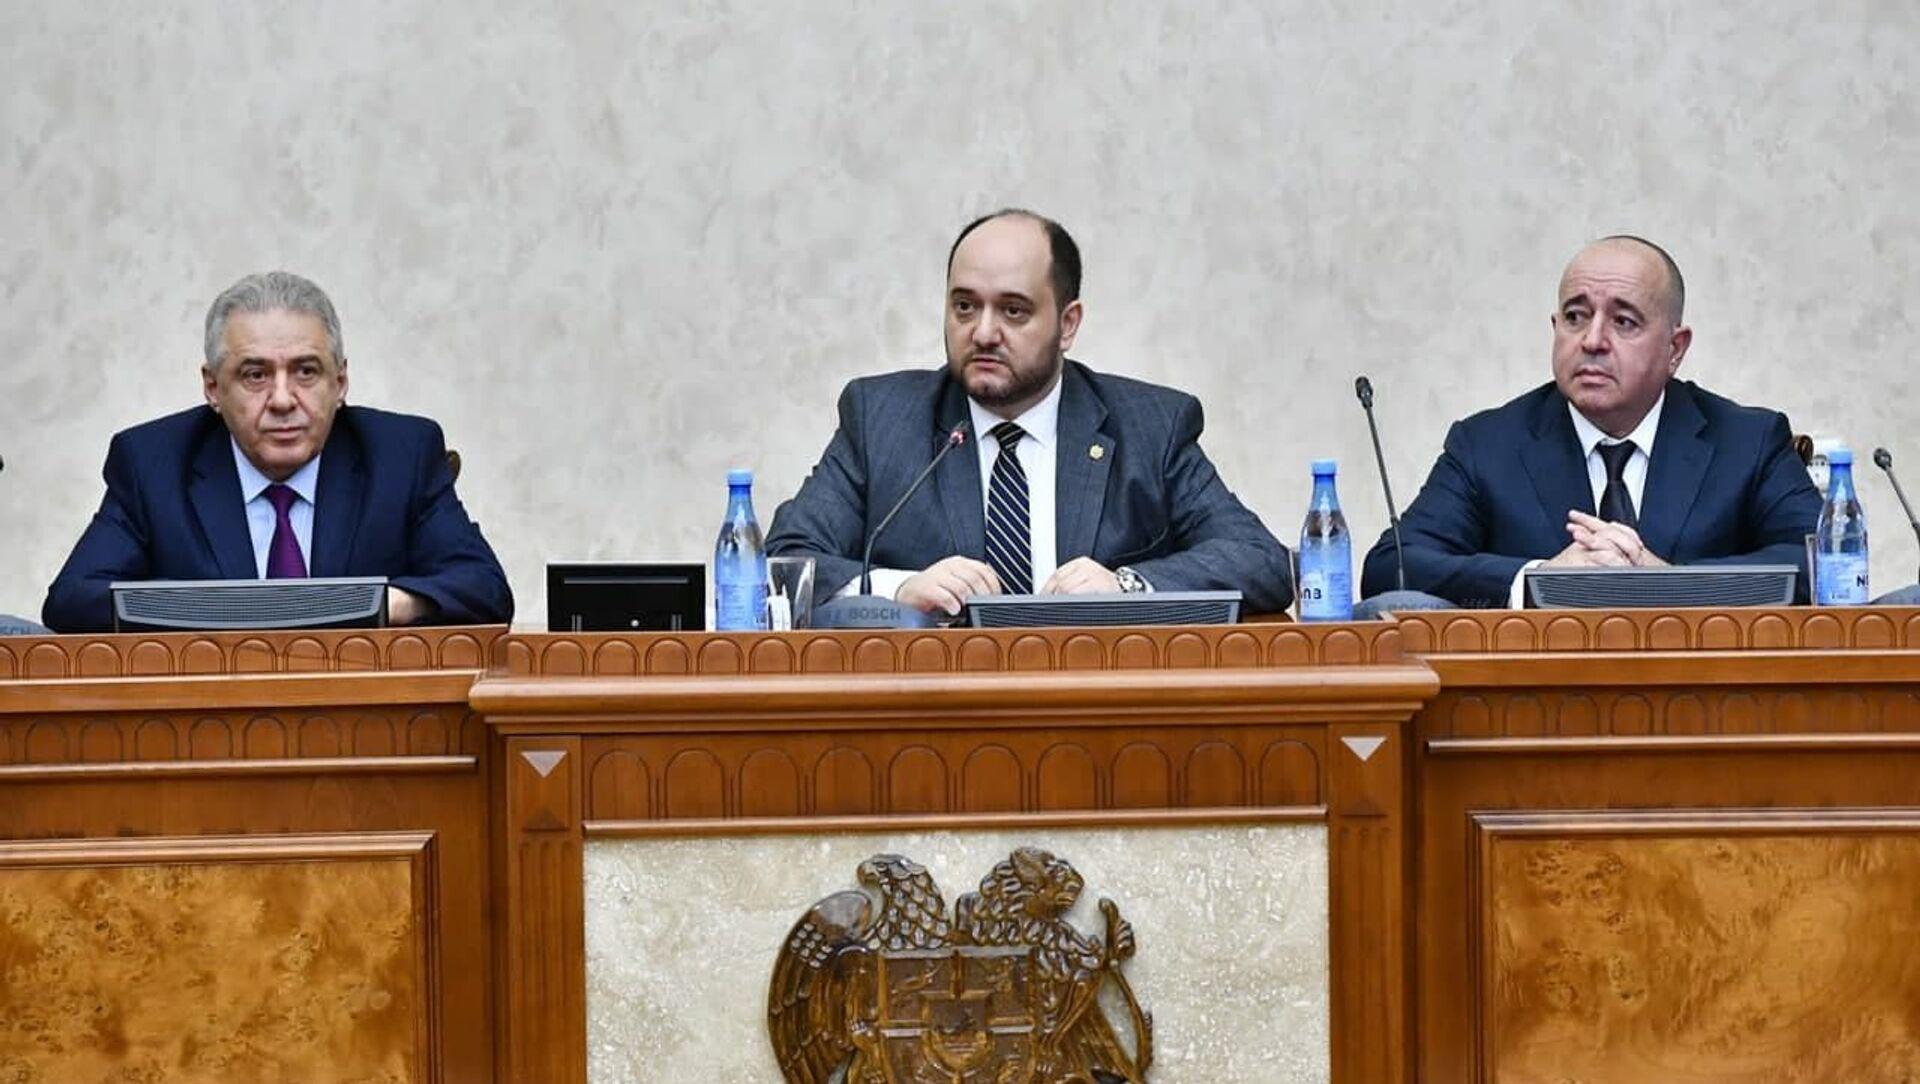 Слева направо: Вагаршак Арутюнян, Араик Арутюнян и Аршак Карапетян на заседании - Sputnik Արմենիա, 1920, 21.07.2021